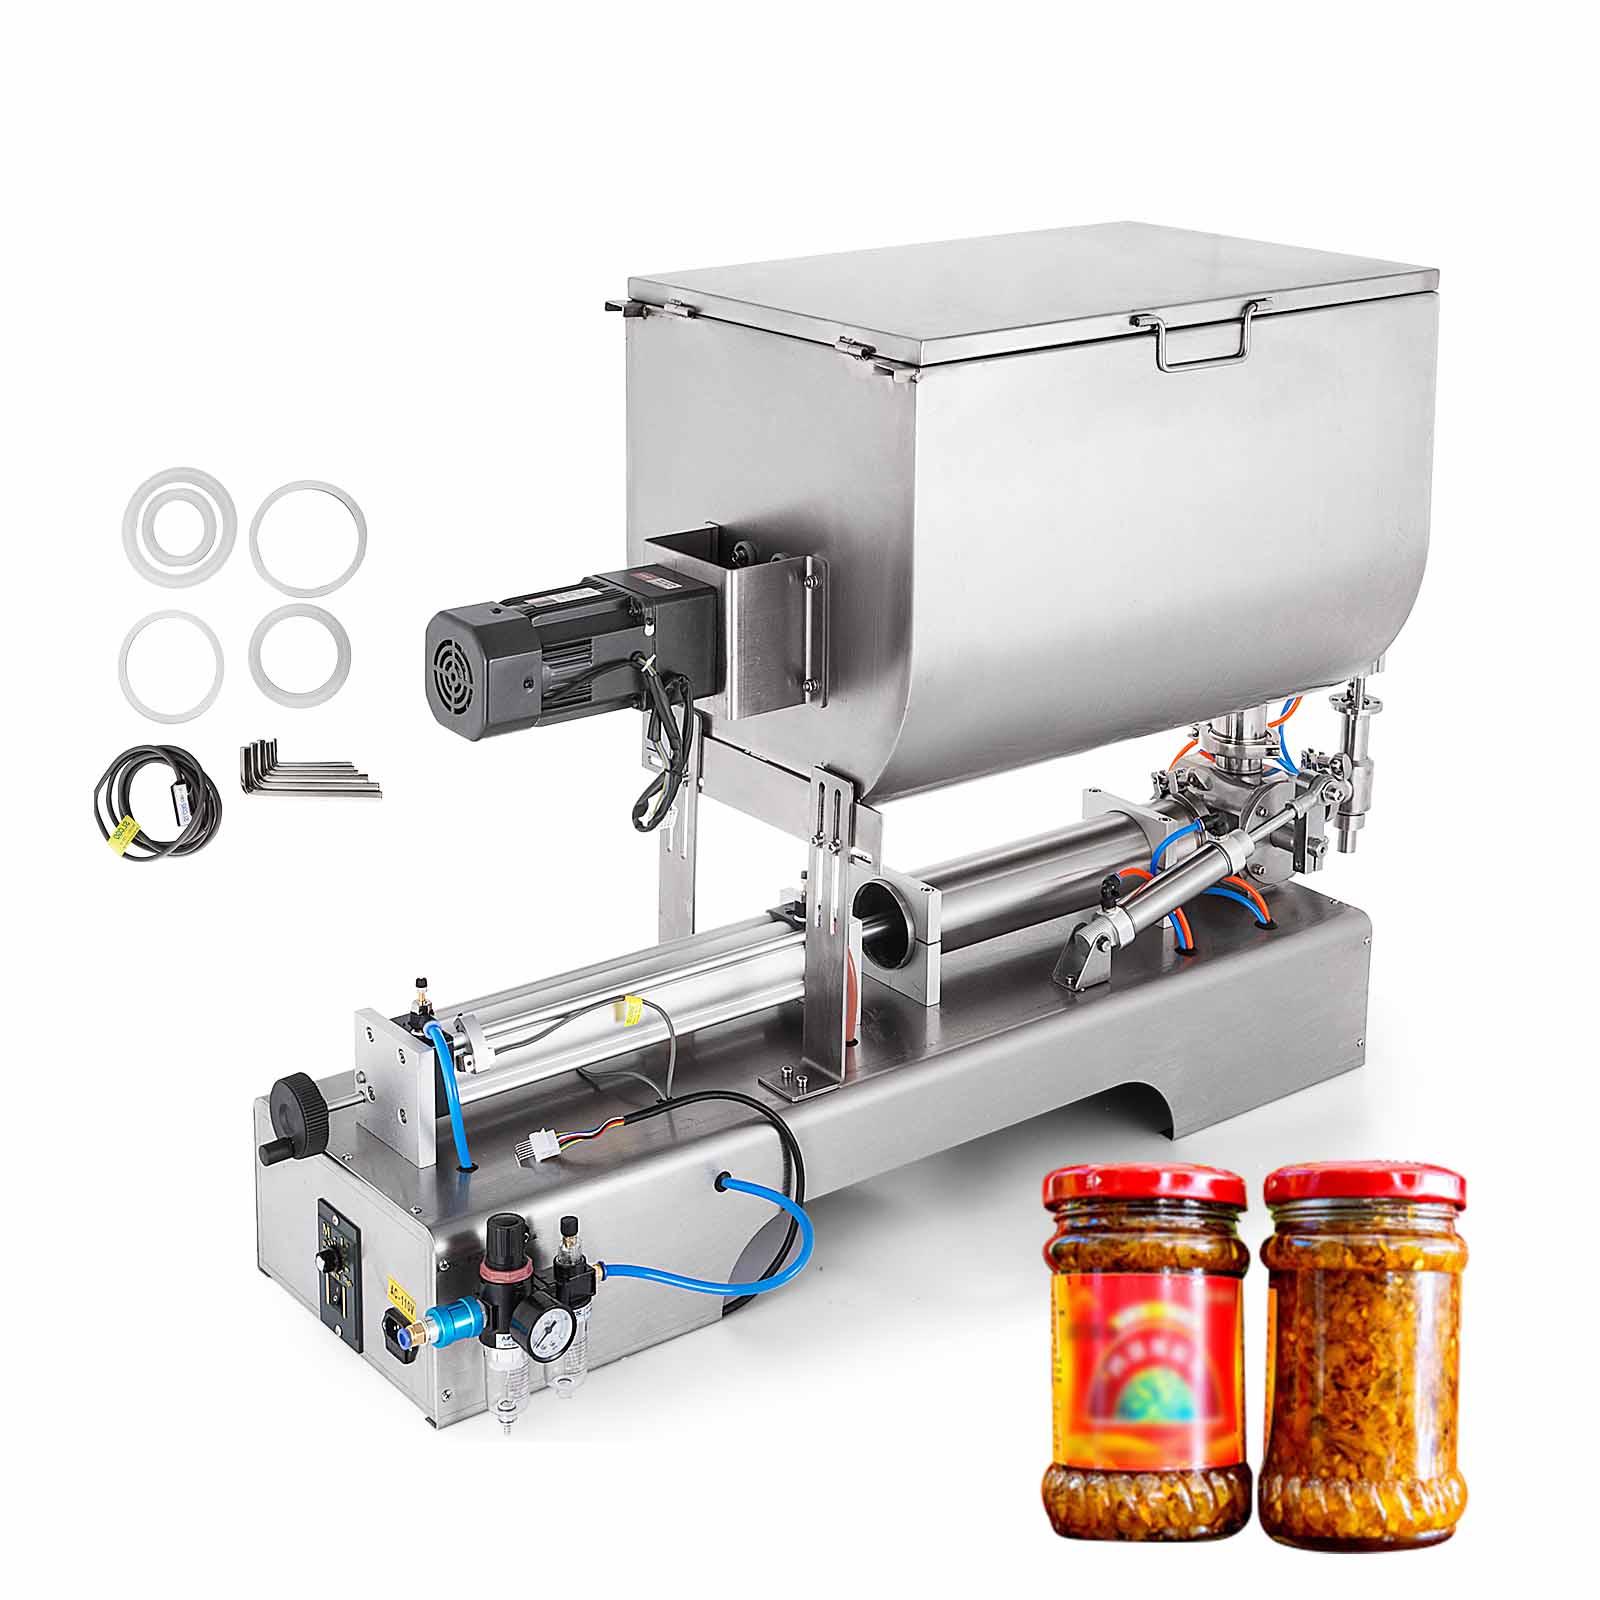 Liquid-Filling-Machine-Filler-Remplissage-2-3500ML-50-500ML-INDUSTRY-SUPPLY miniature 96